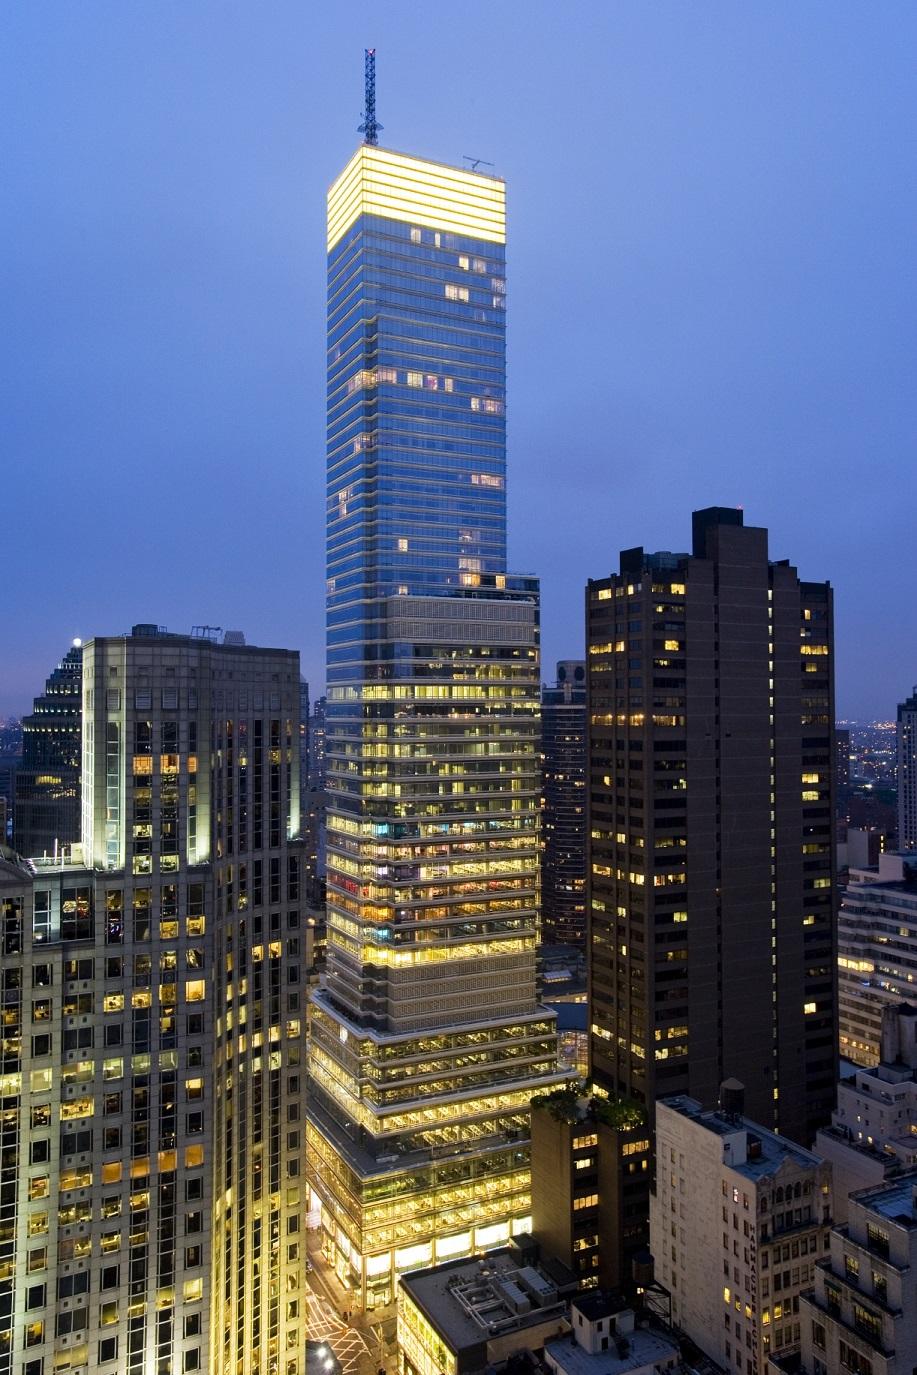 Night view of illuminated building